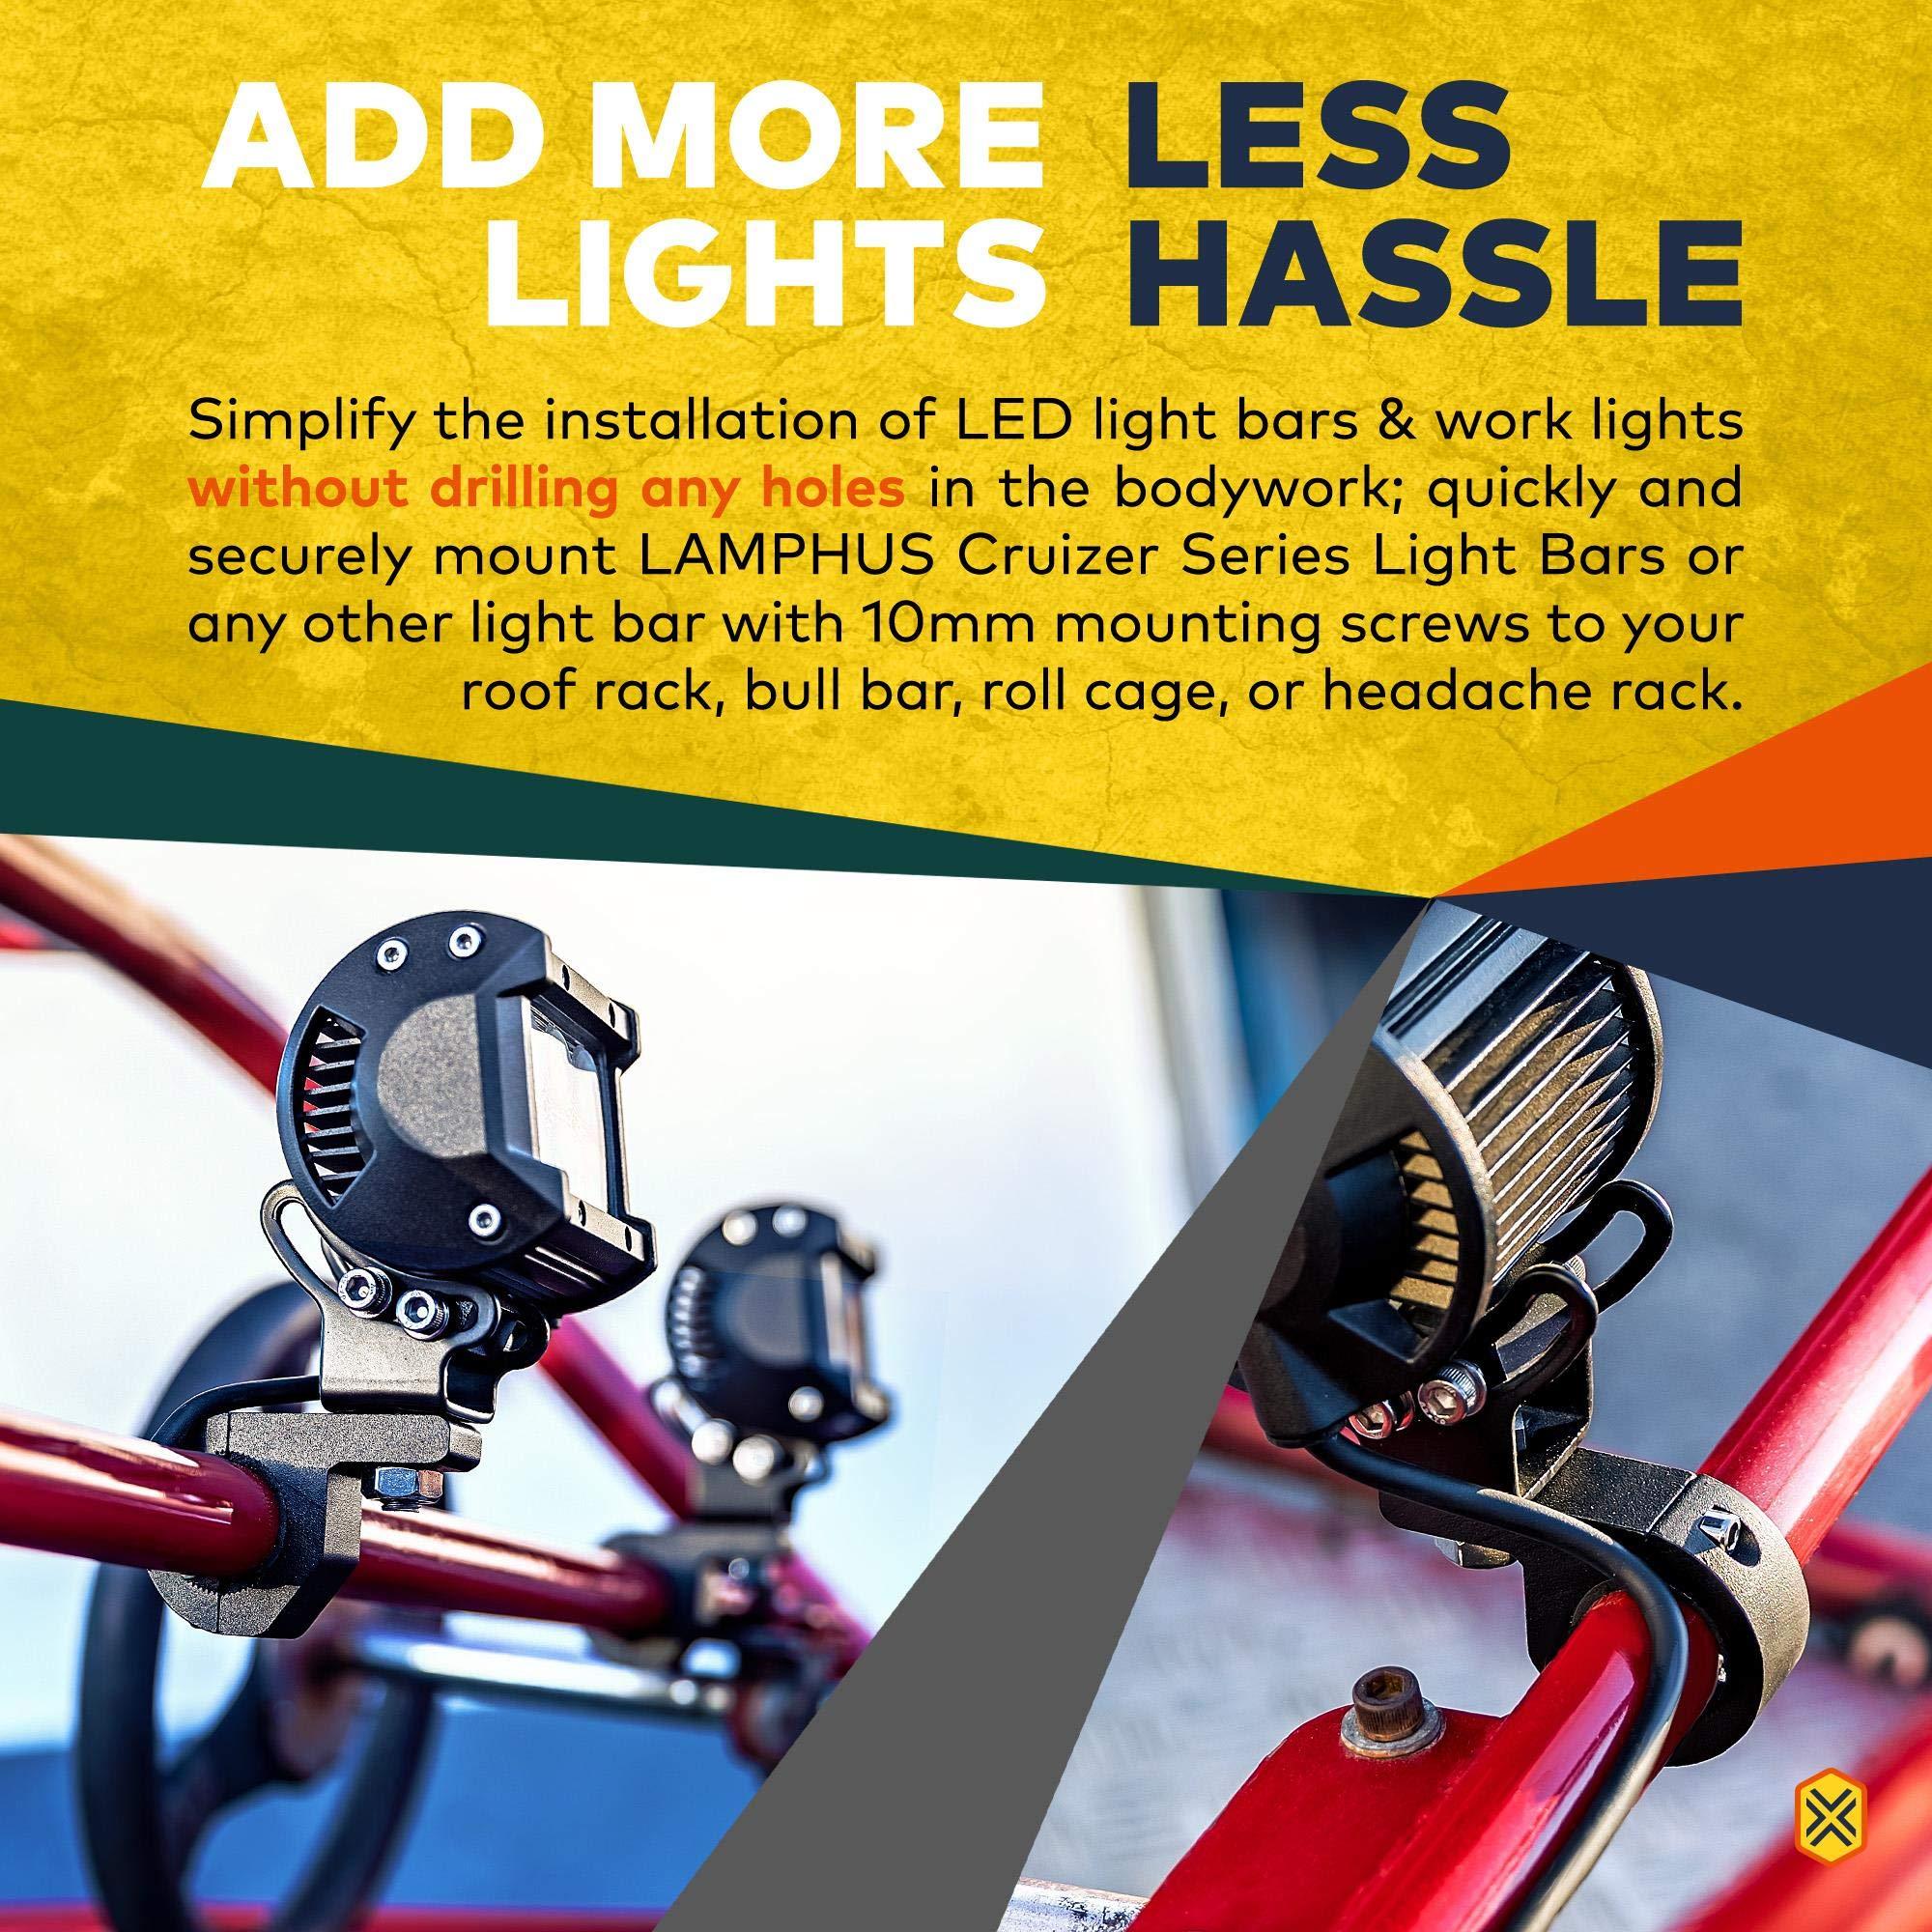 2 Years Warranty Mini Nilight 90027B 2-Pack 2PCS LED Light Horizontal Clamp Mounting Kit Fit on 0.75 1 1.25 Bull Bars Roof Racks Roll Cages for ATV UTV and Trucks